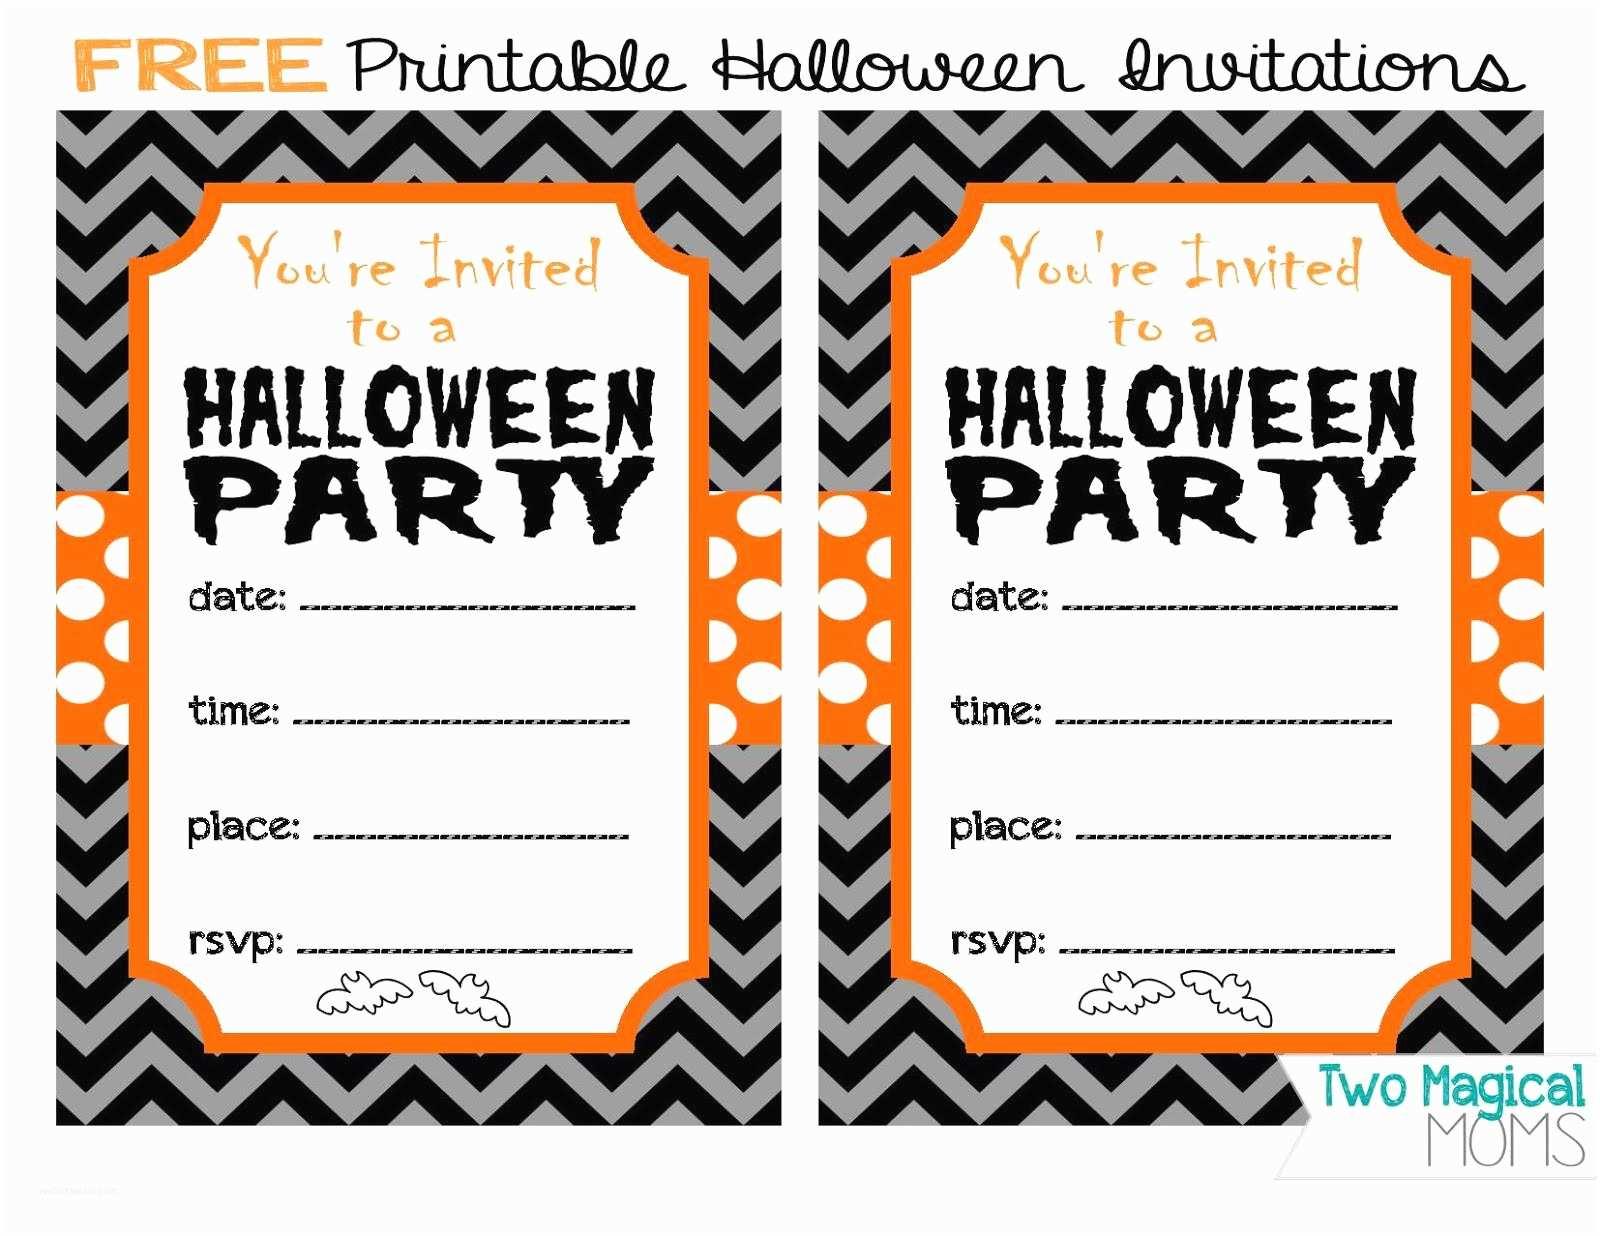 Halloween Party Invitations Halloween Party Invitation Wording